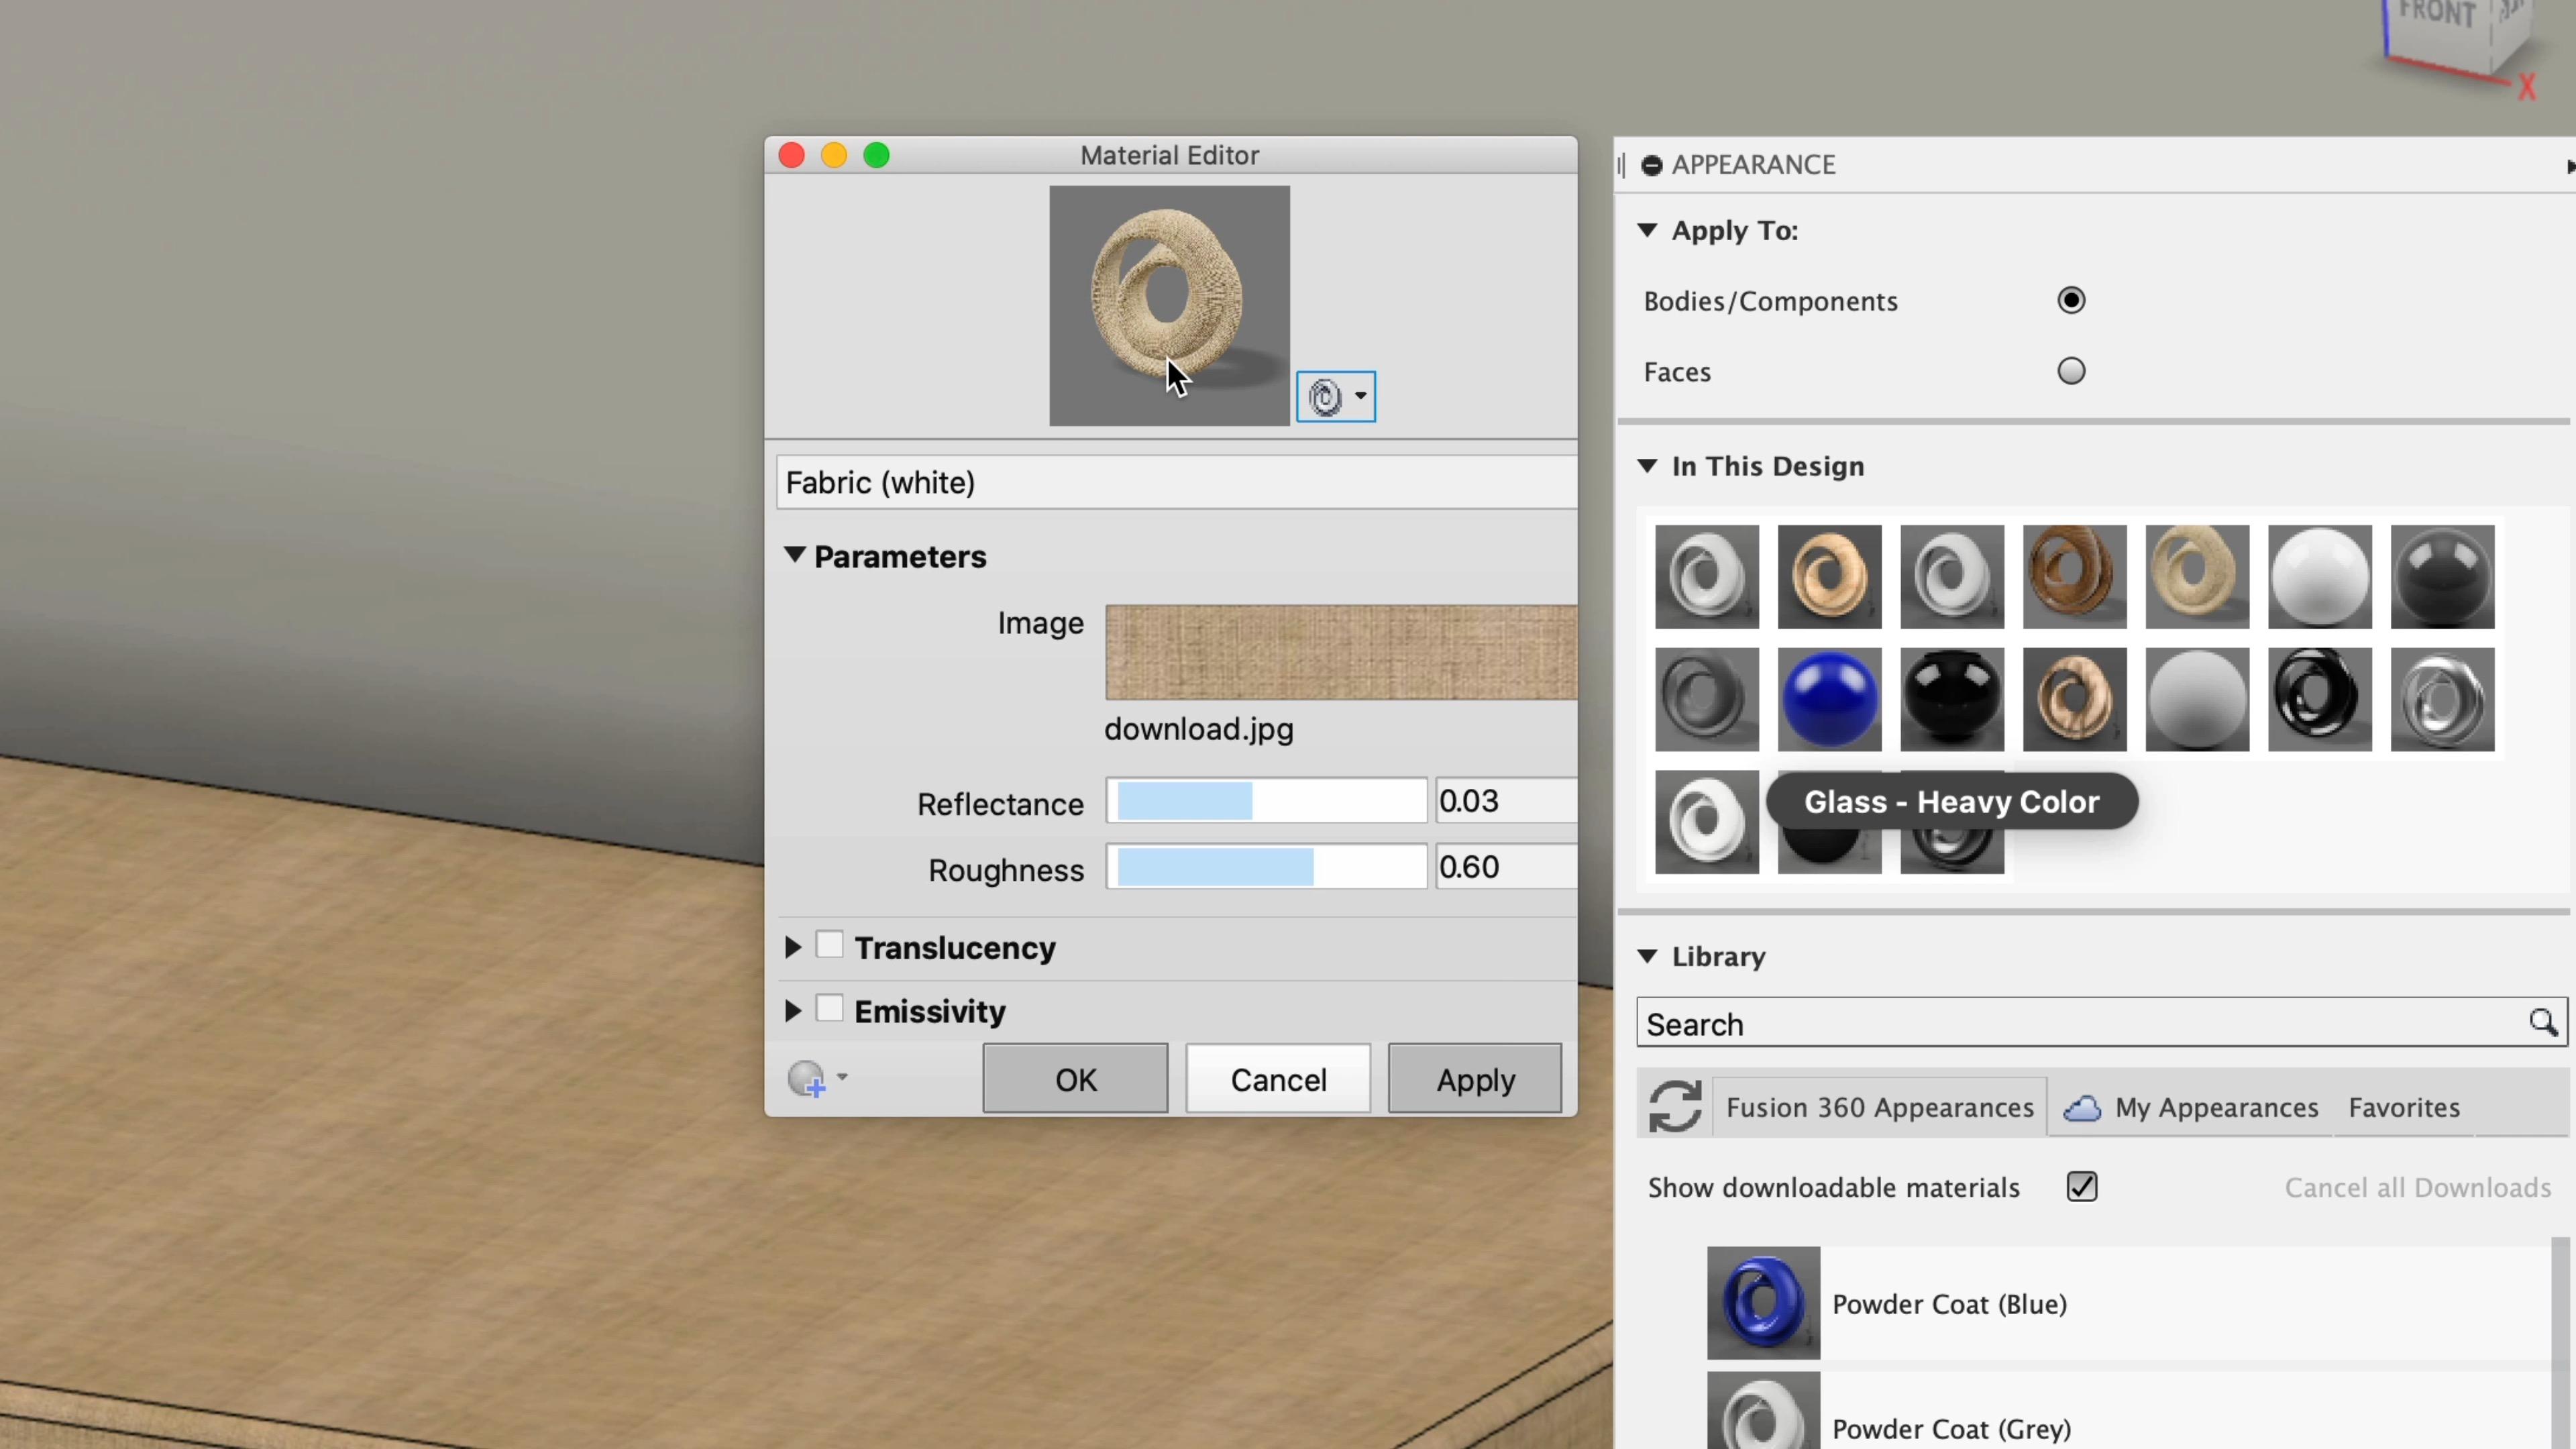 Material editor in Fusion 360